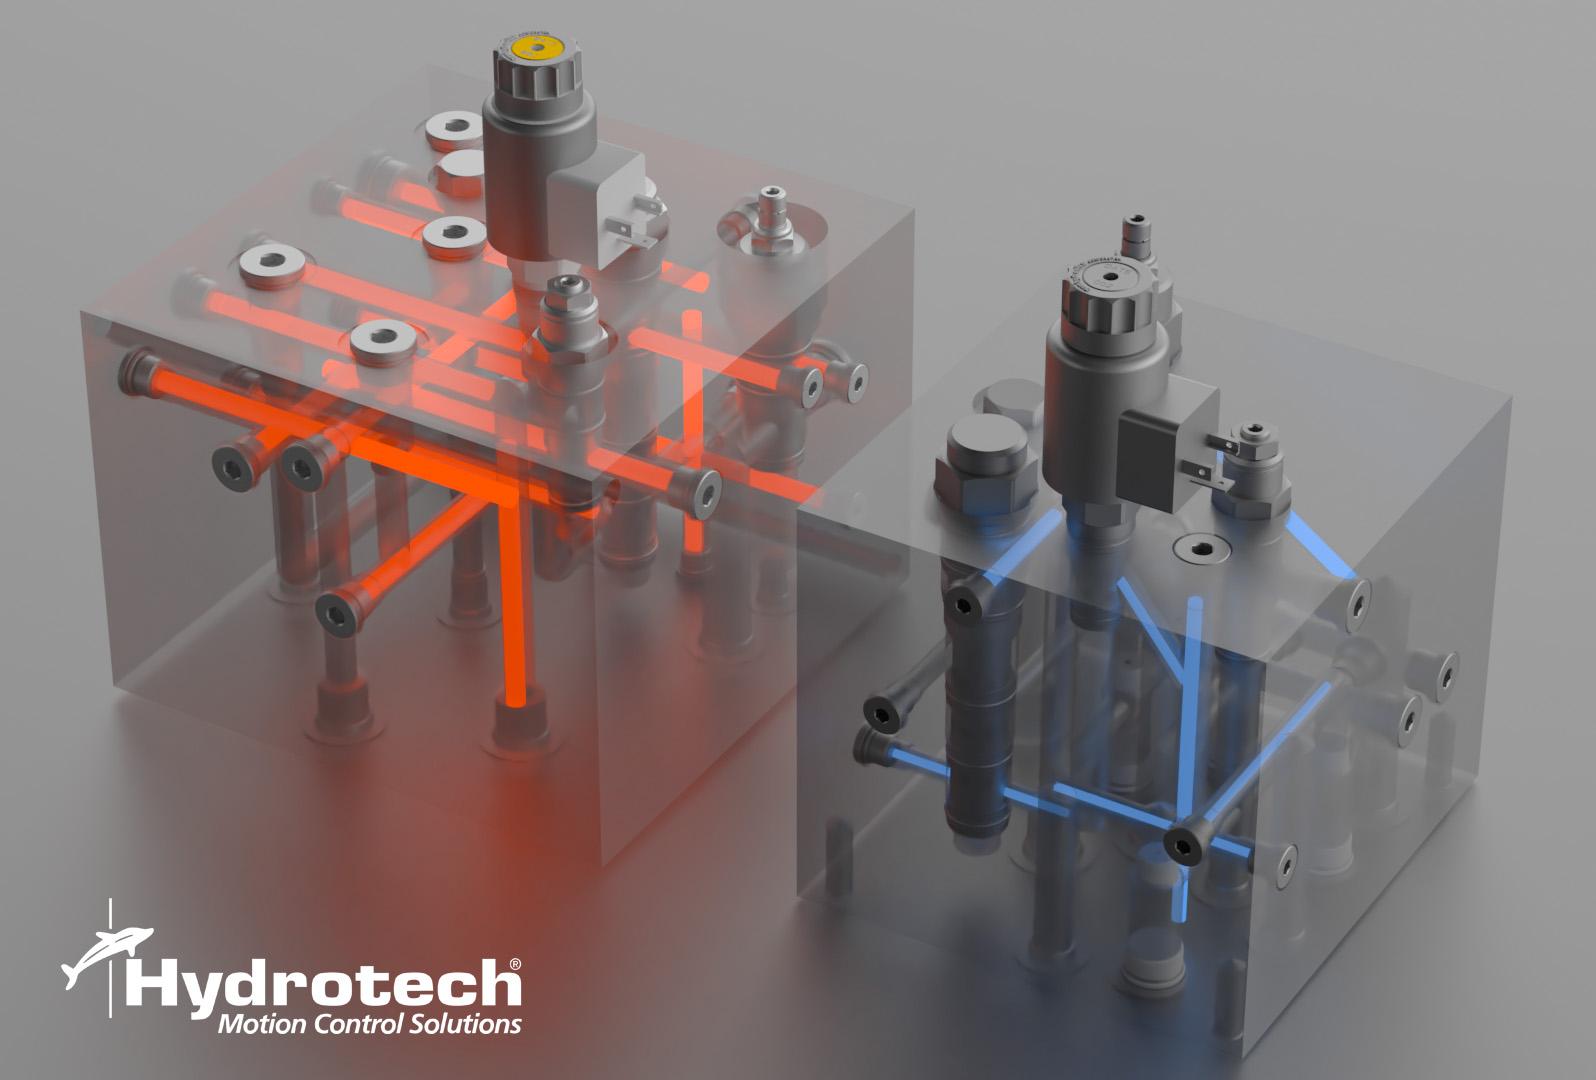 Sun Hydraulics Quick Design